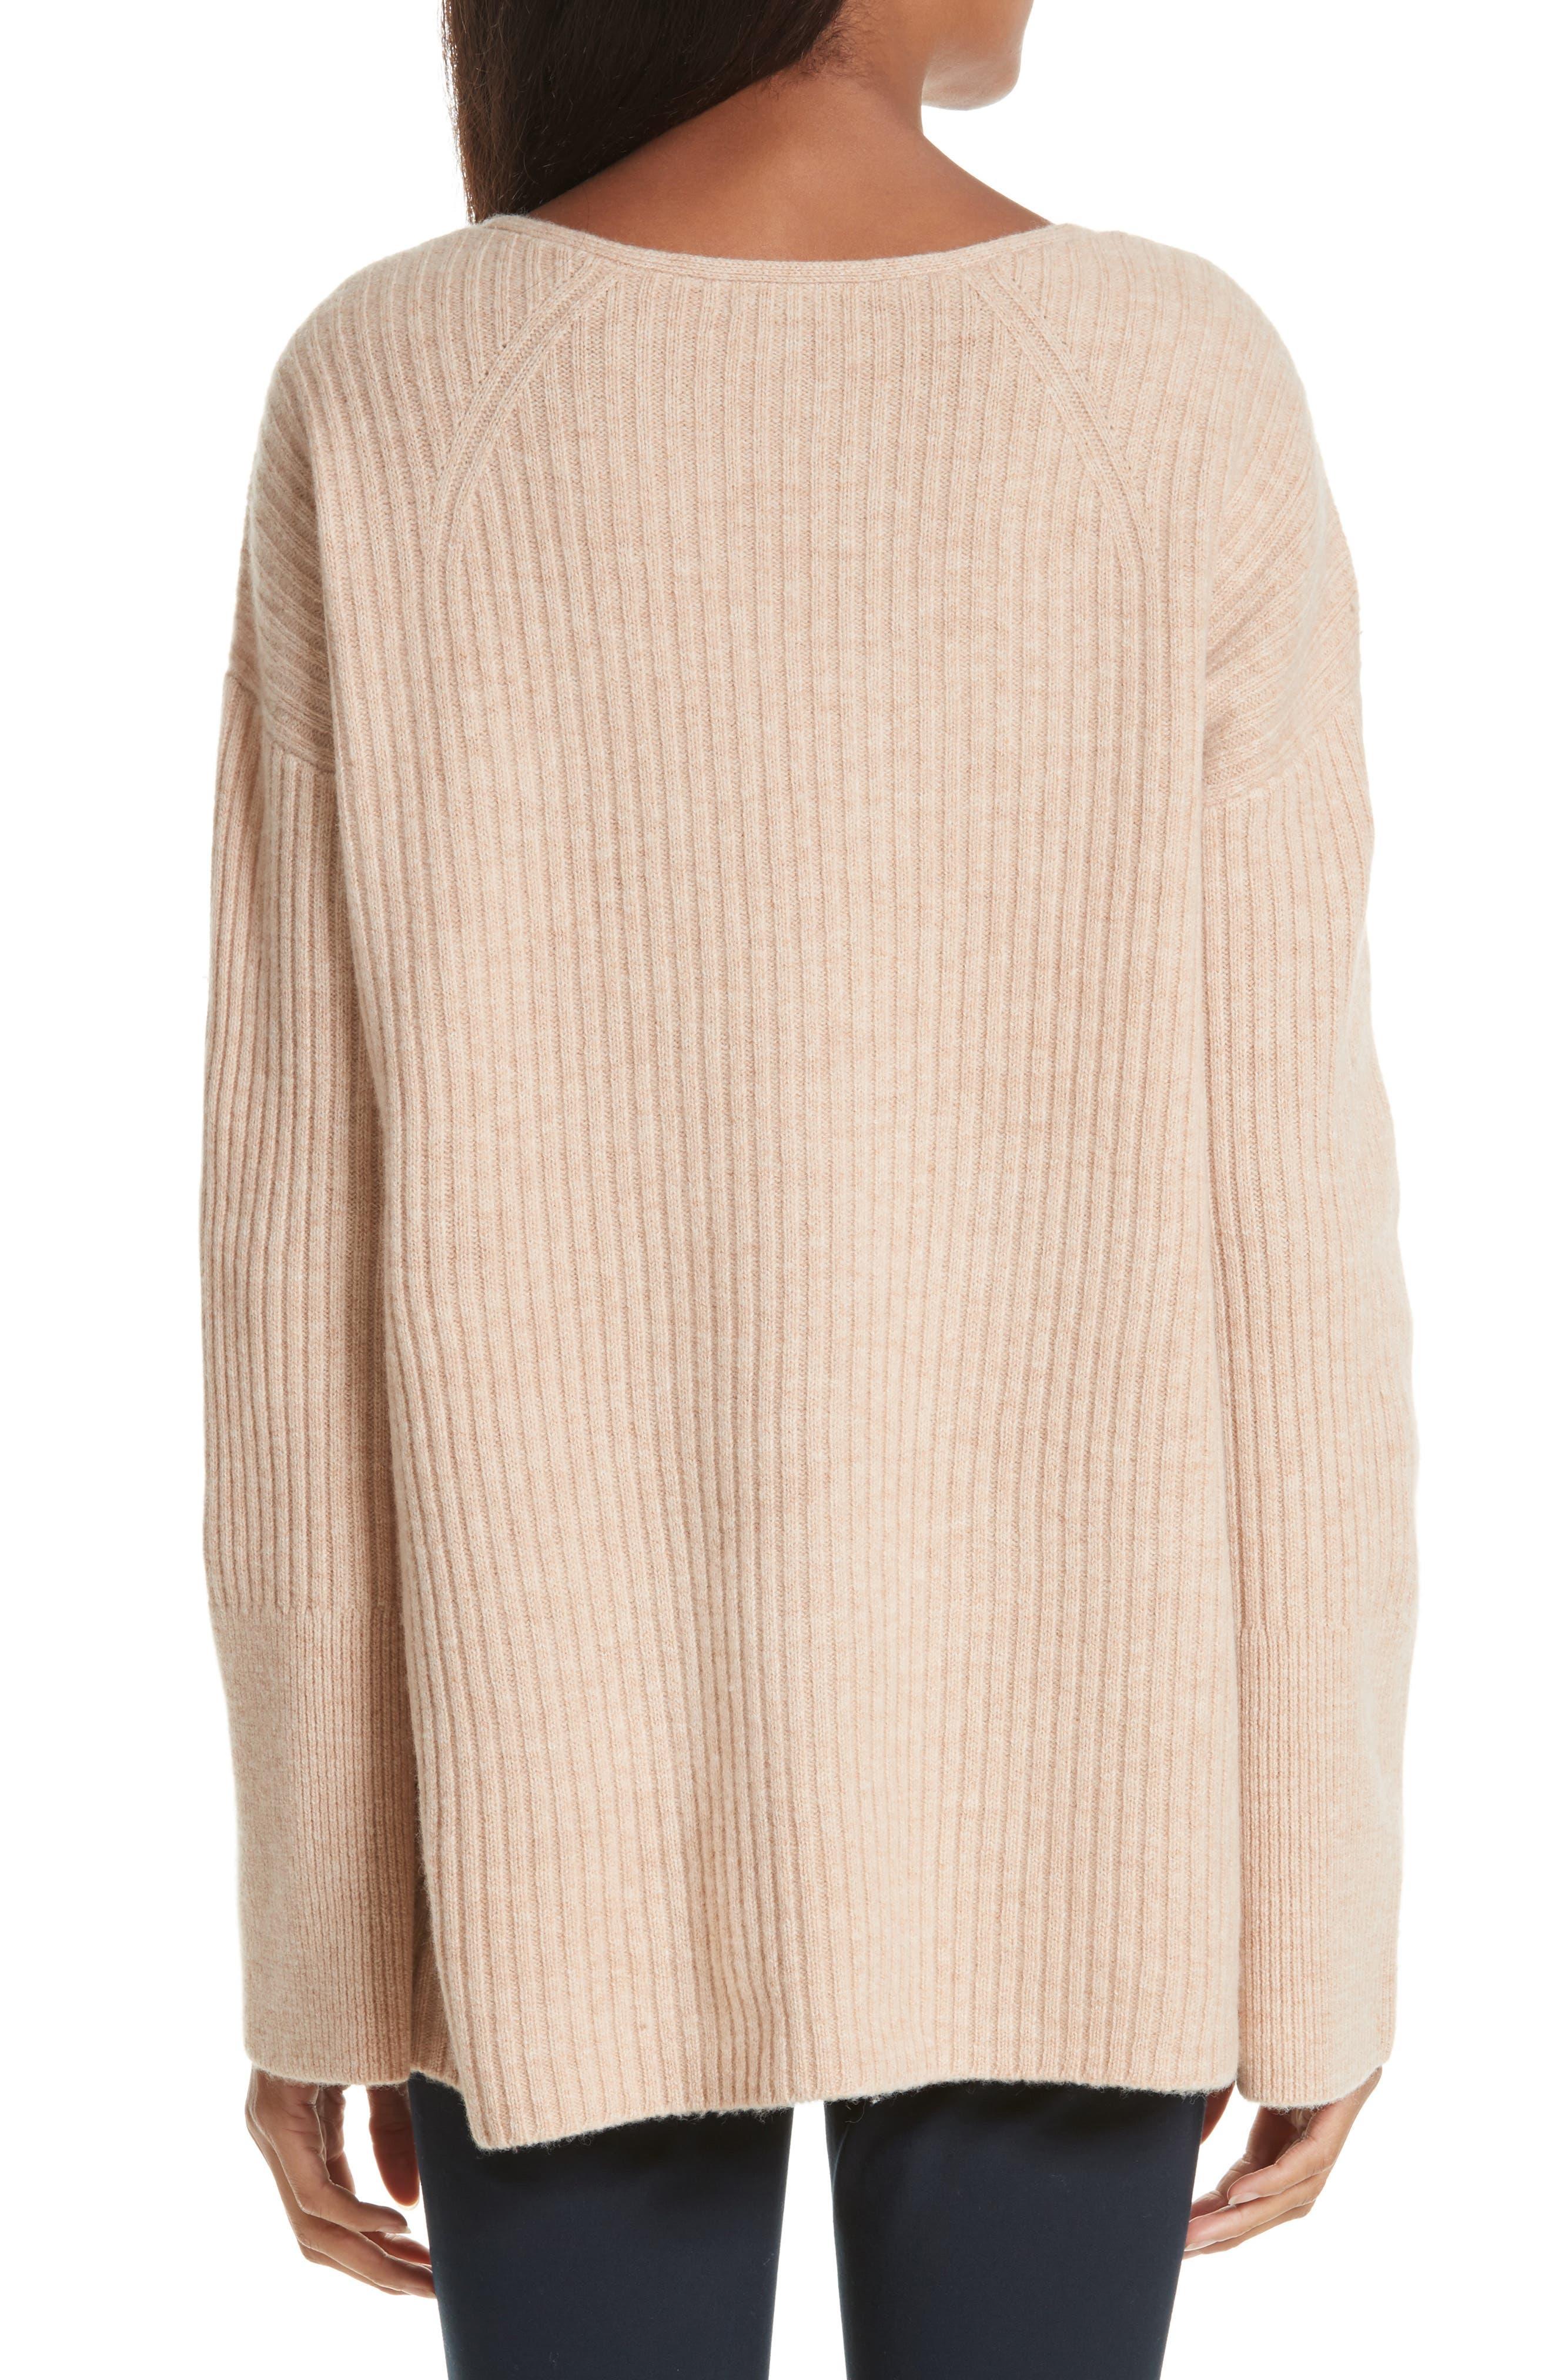 Mitchell Merino Wool Sweater,                             Alternate thumbnail 2, color,